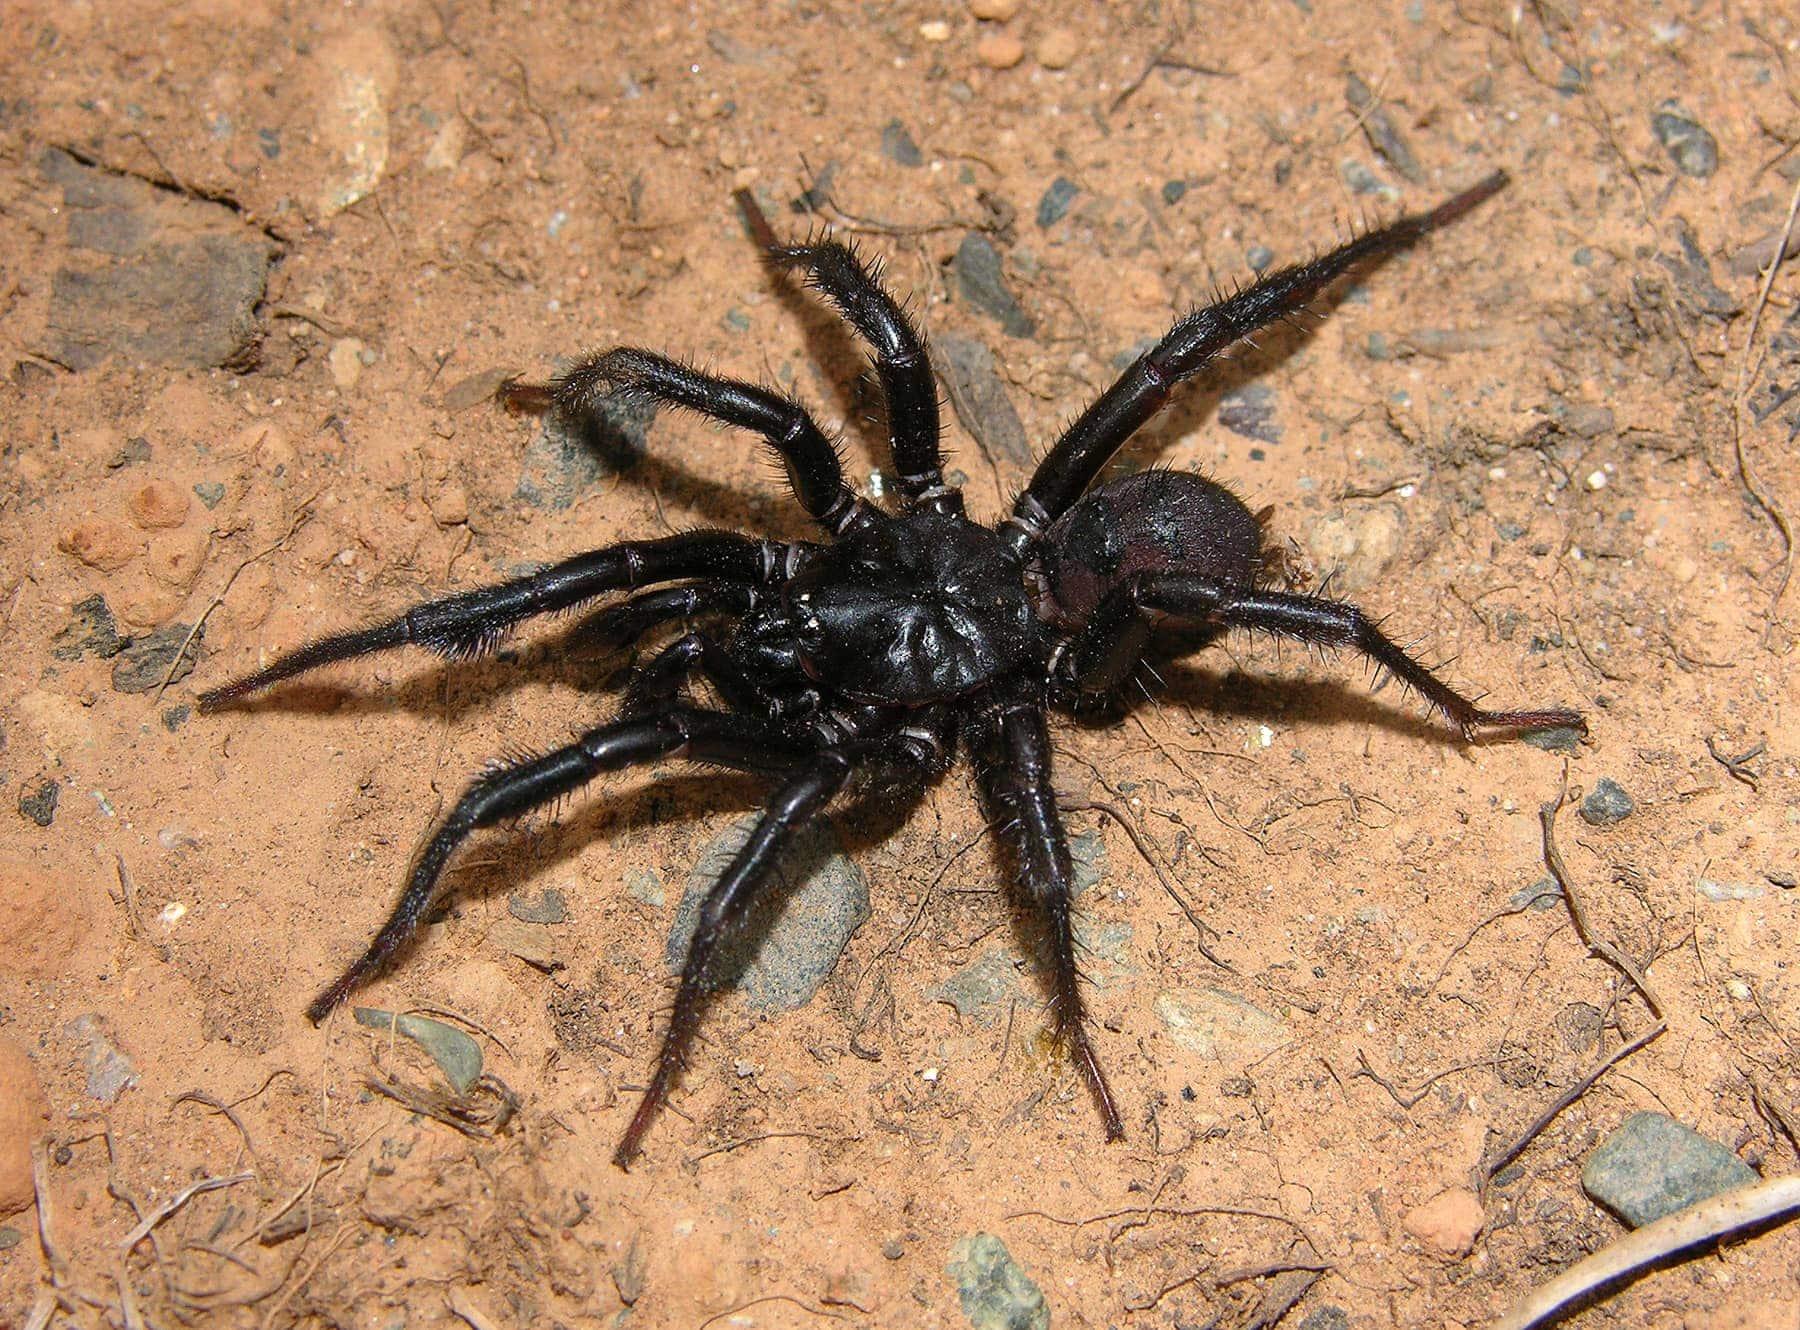 Picture of Antrodiaetus pacificus - Male - Dorsal